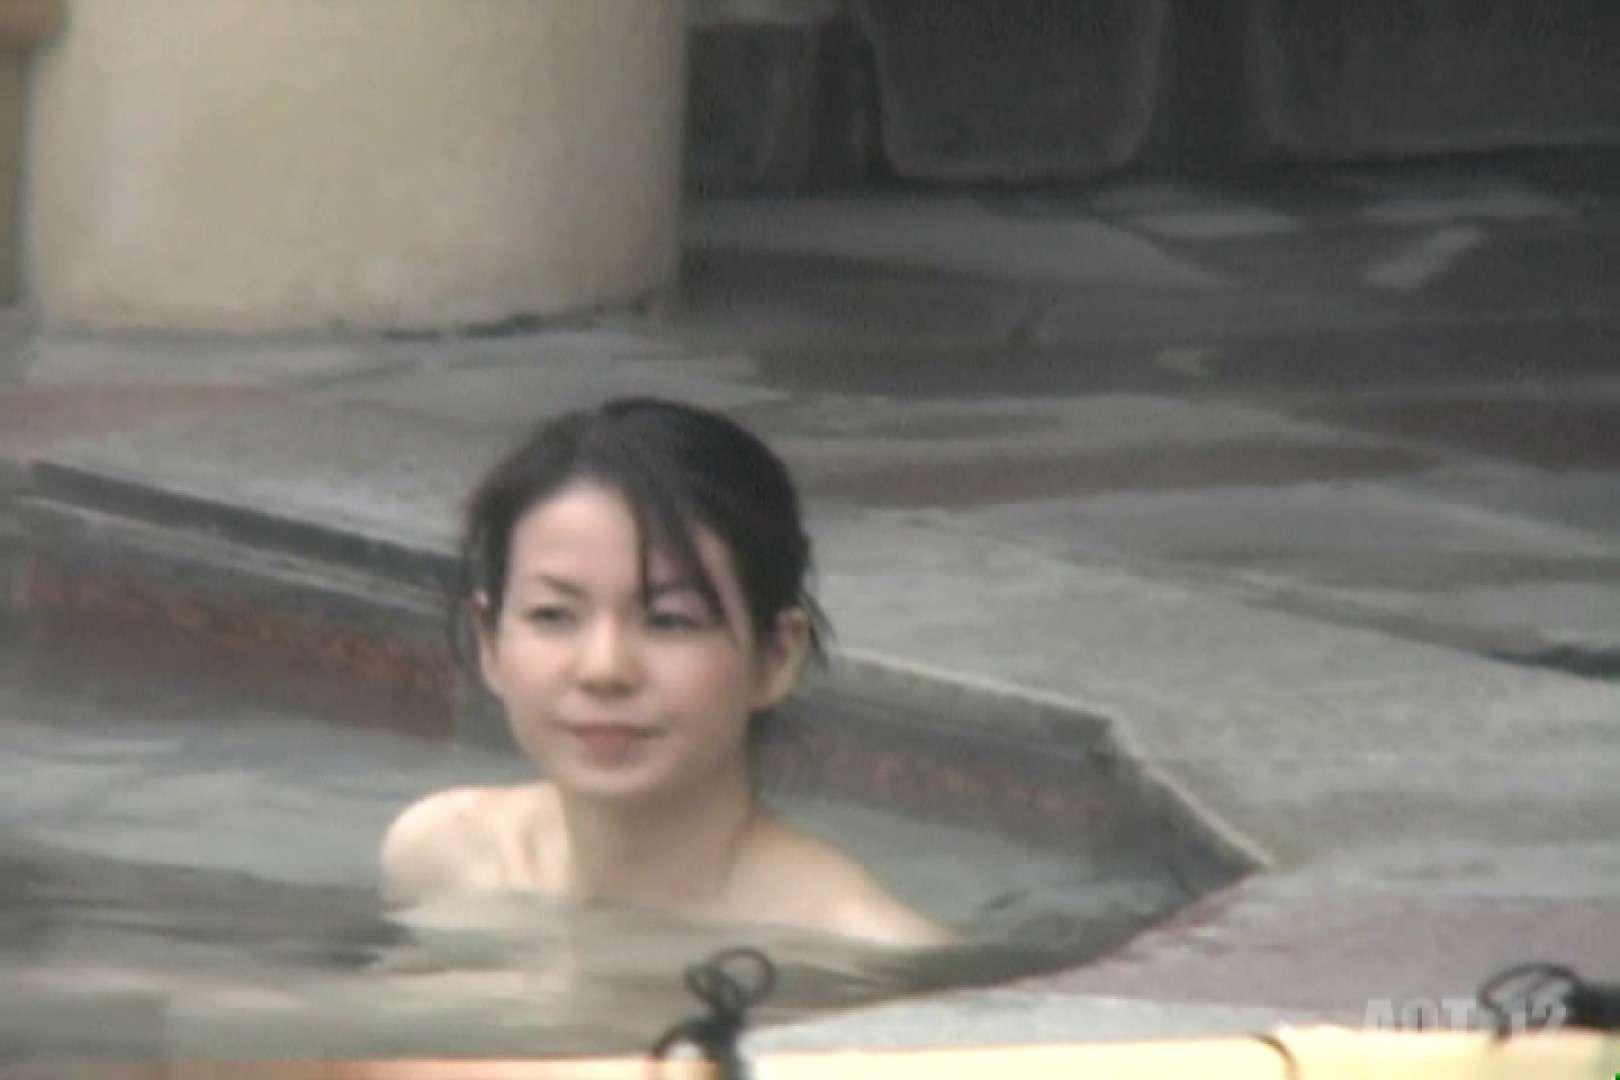 Aquaな露天風呂Vol.811 露天風呂編 | 盗撮シリーズ  75PIX 1